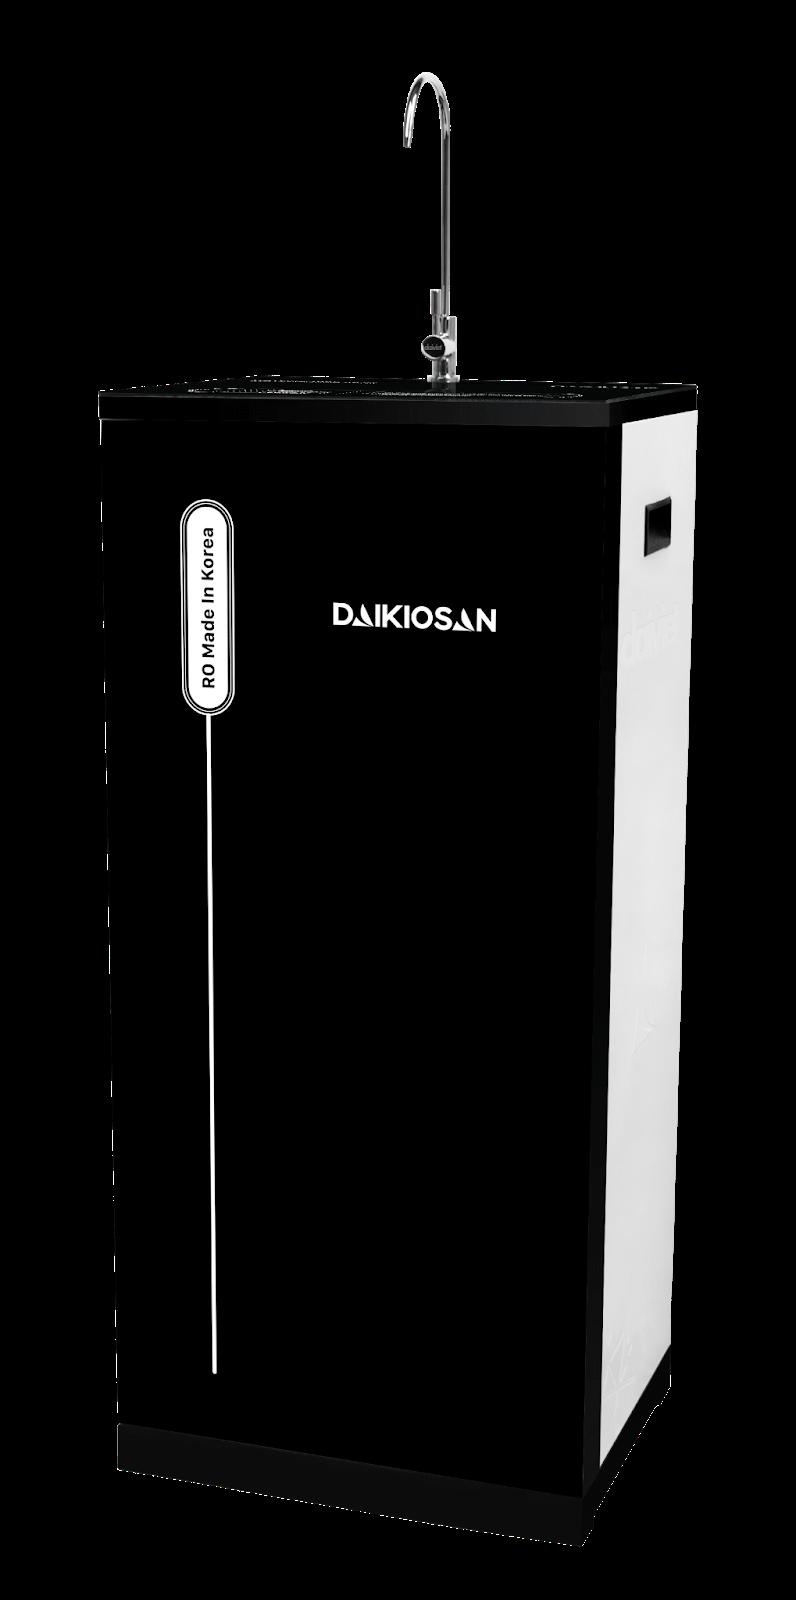 máy lọc nước daikiosan DSW-42010H3